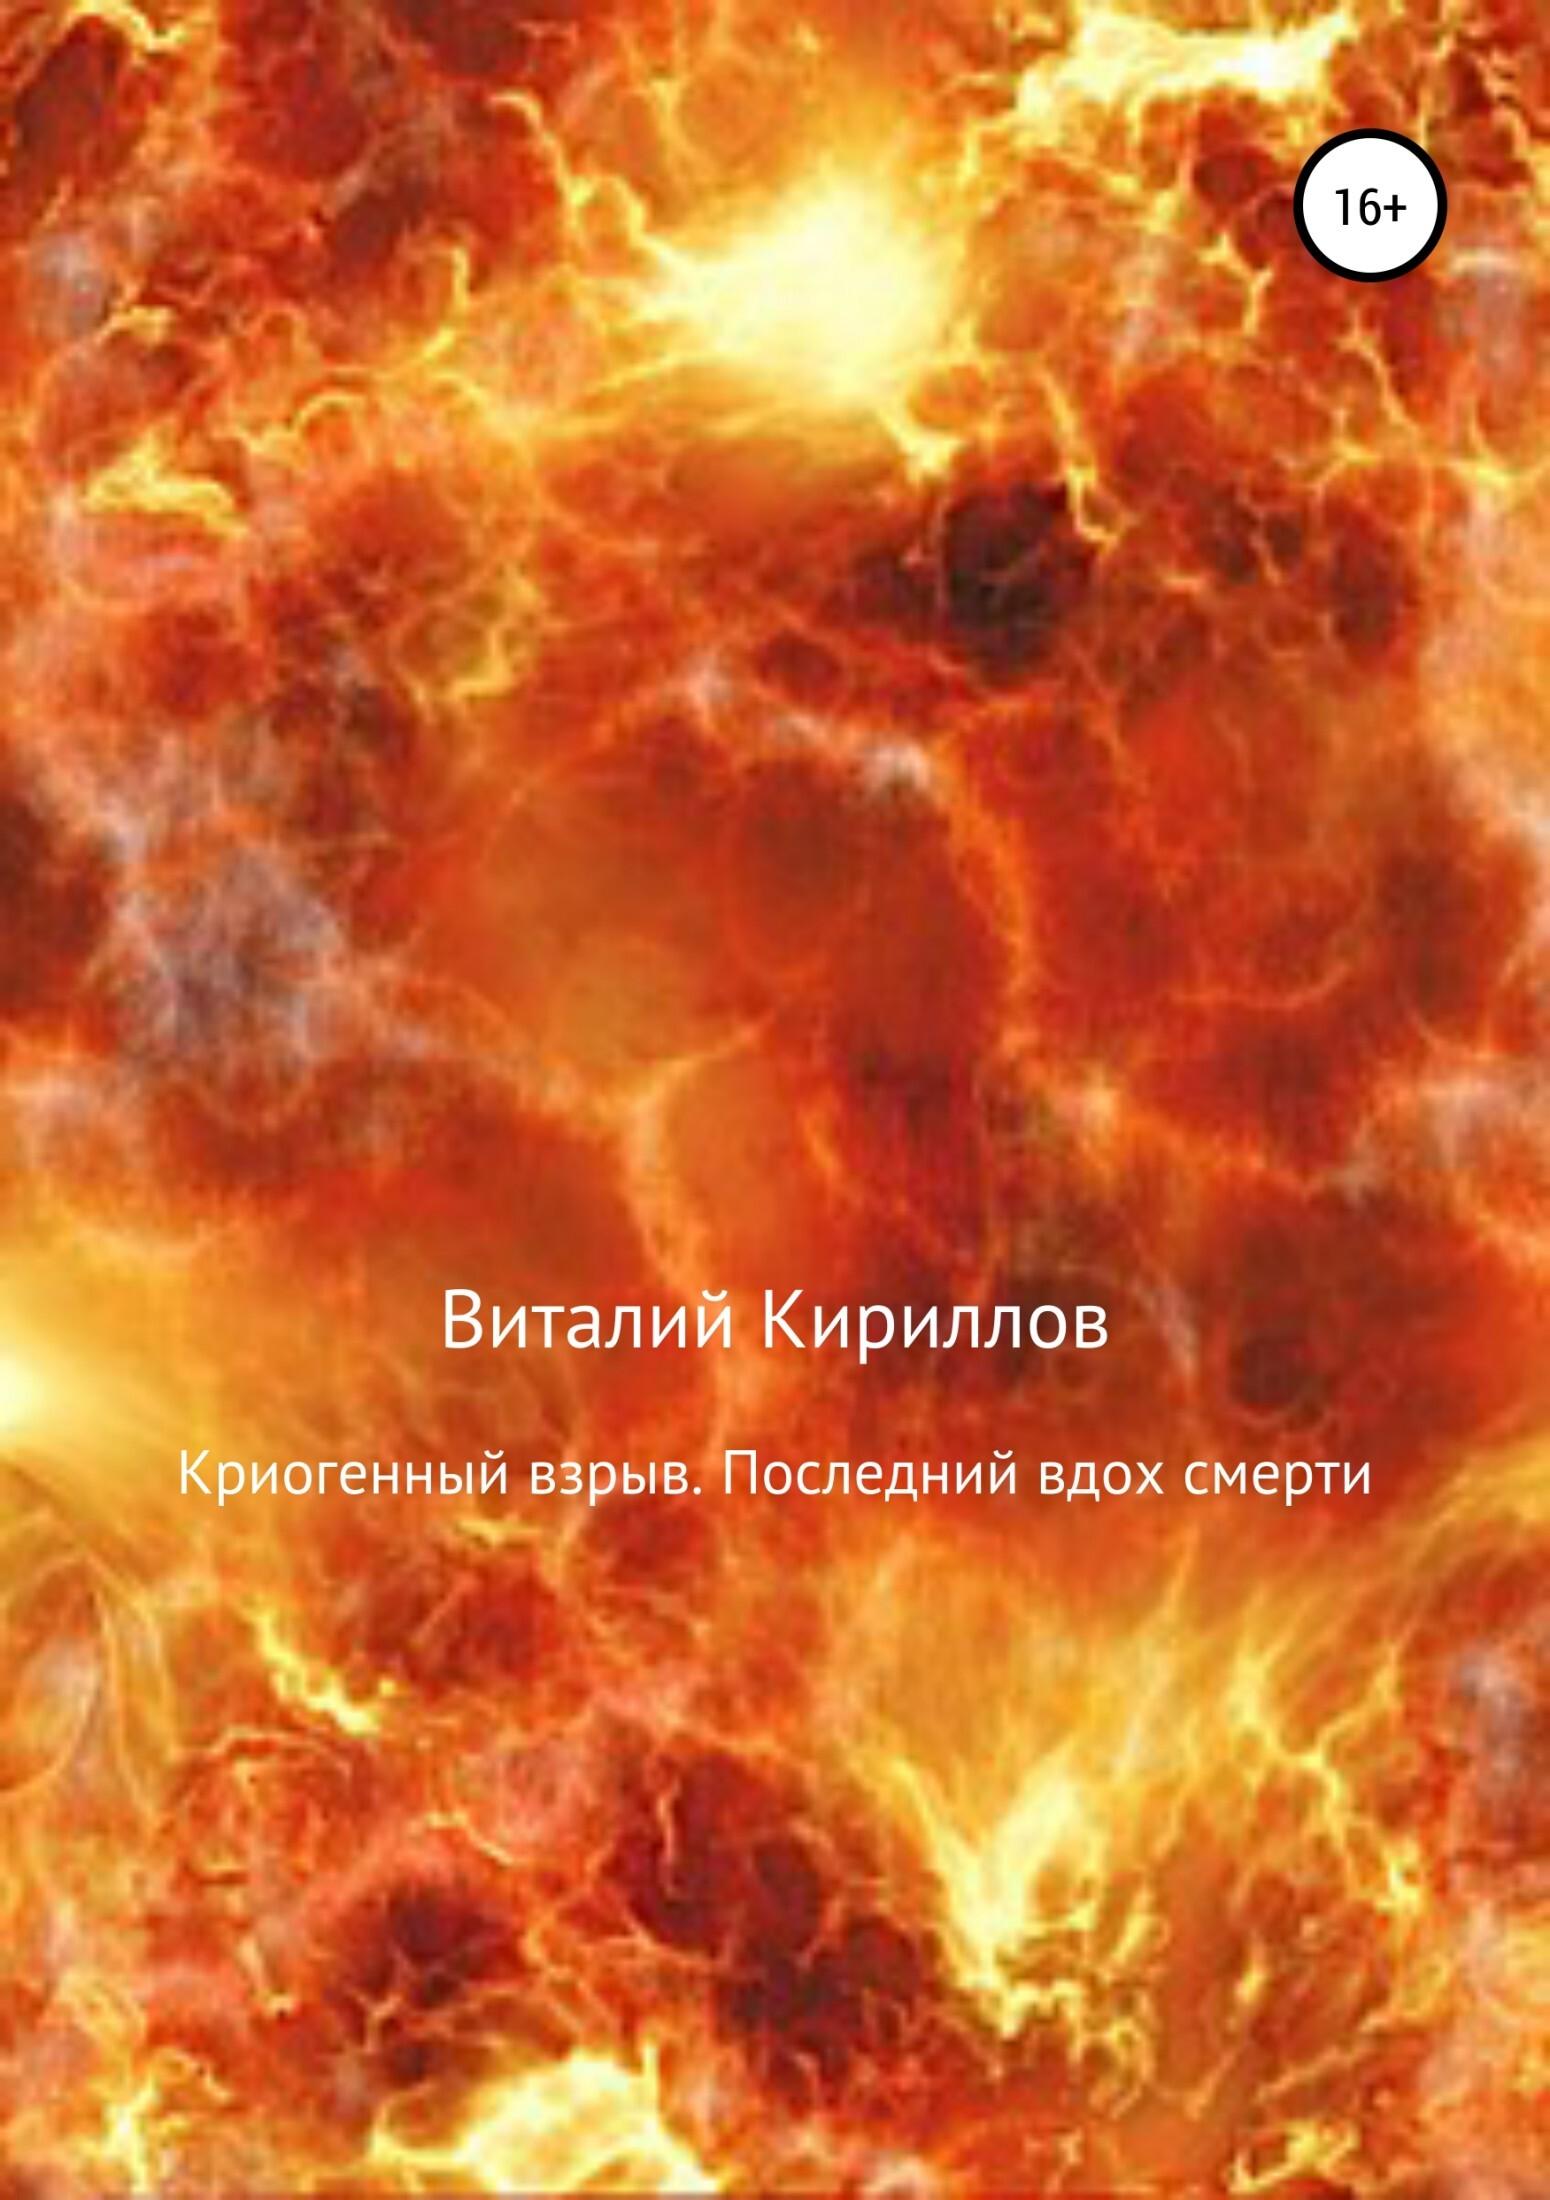 Виталий Александрович Кириллов Криогенный взрыв. Последний вдох смерти виталий александрович кириллов инсайдер последний пророк